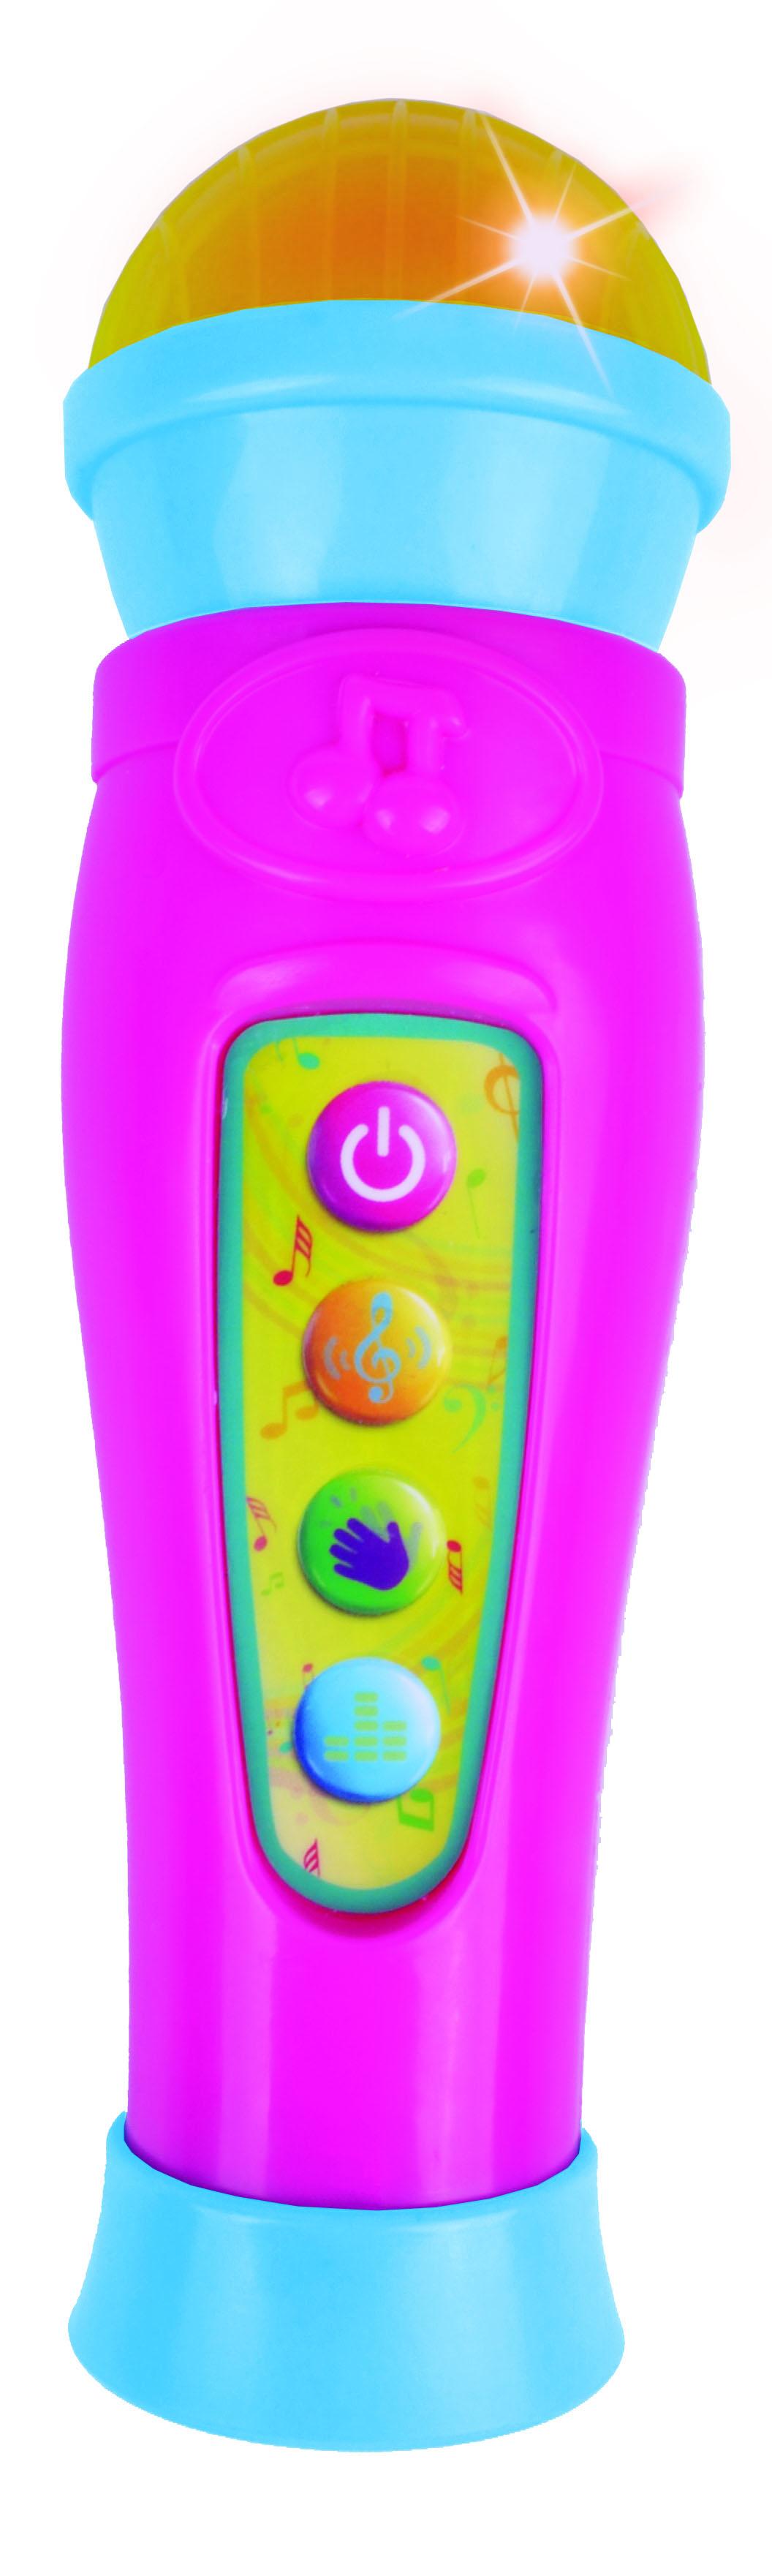 Музыкальная игрушка Red Box 25772 розовый, голубой, желтый цена